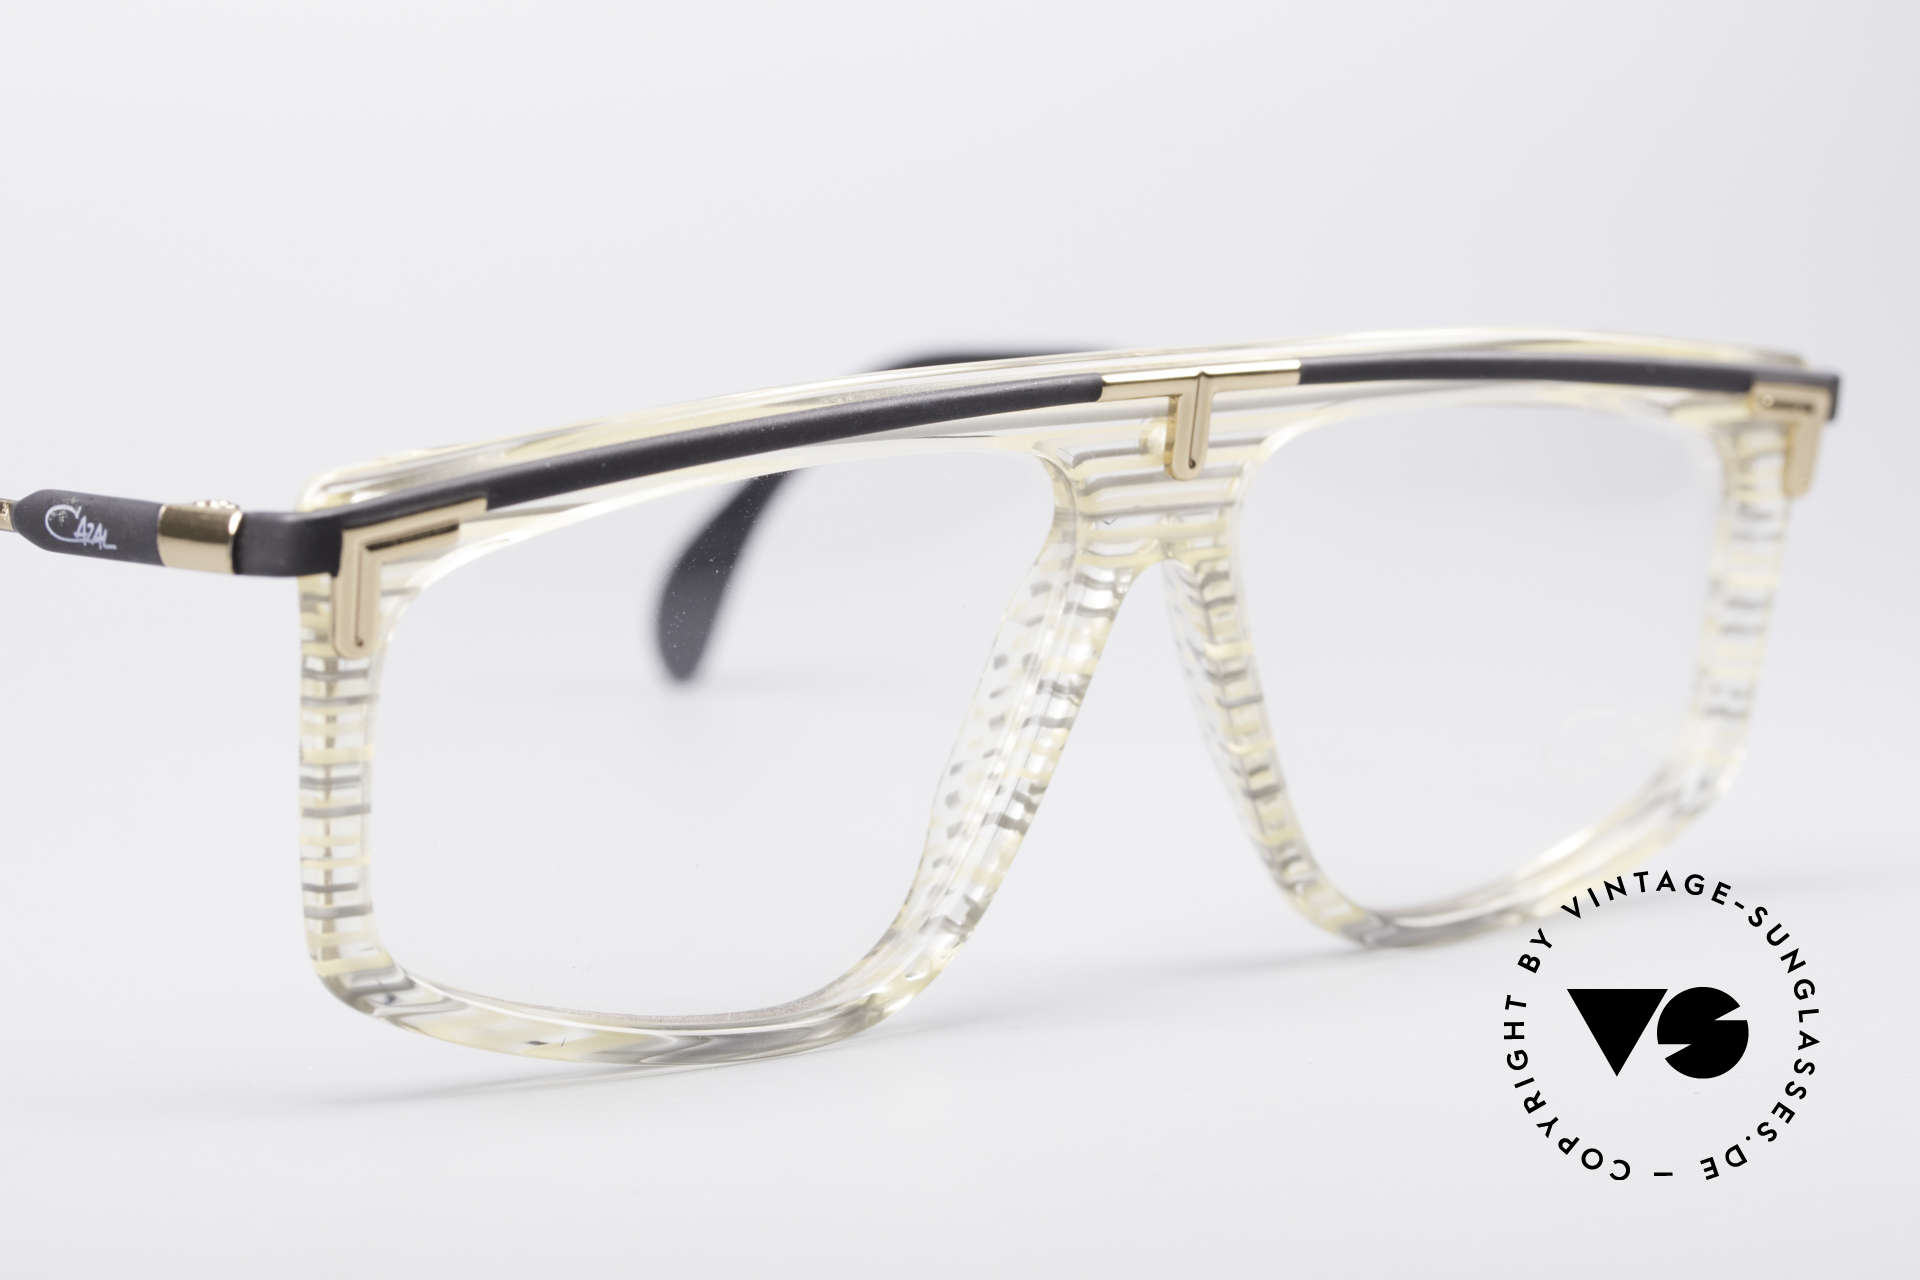 Cazal 190 Old School Hip Hop Frame, today called as 'HipHop glasses' or 'old school glasses', Made for Men